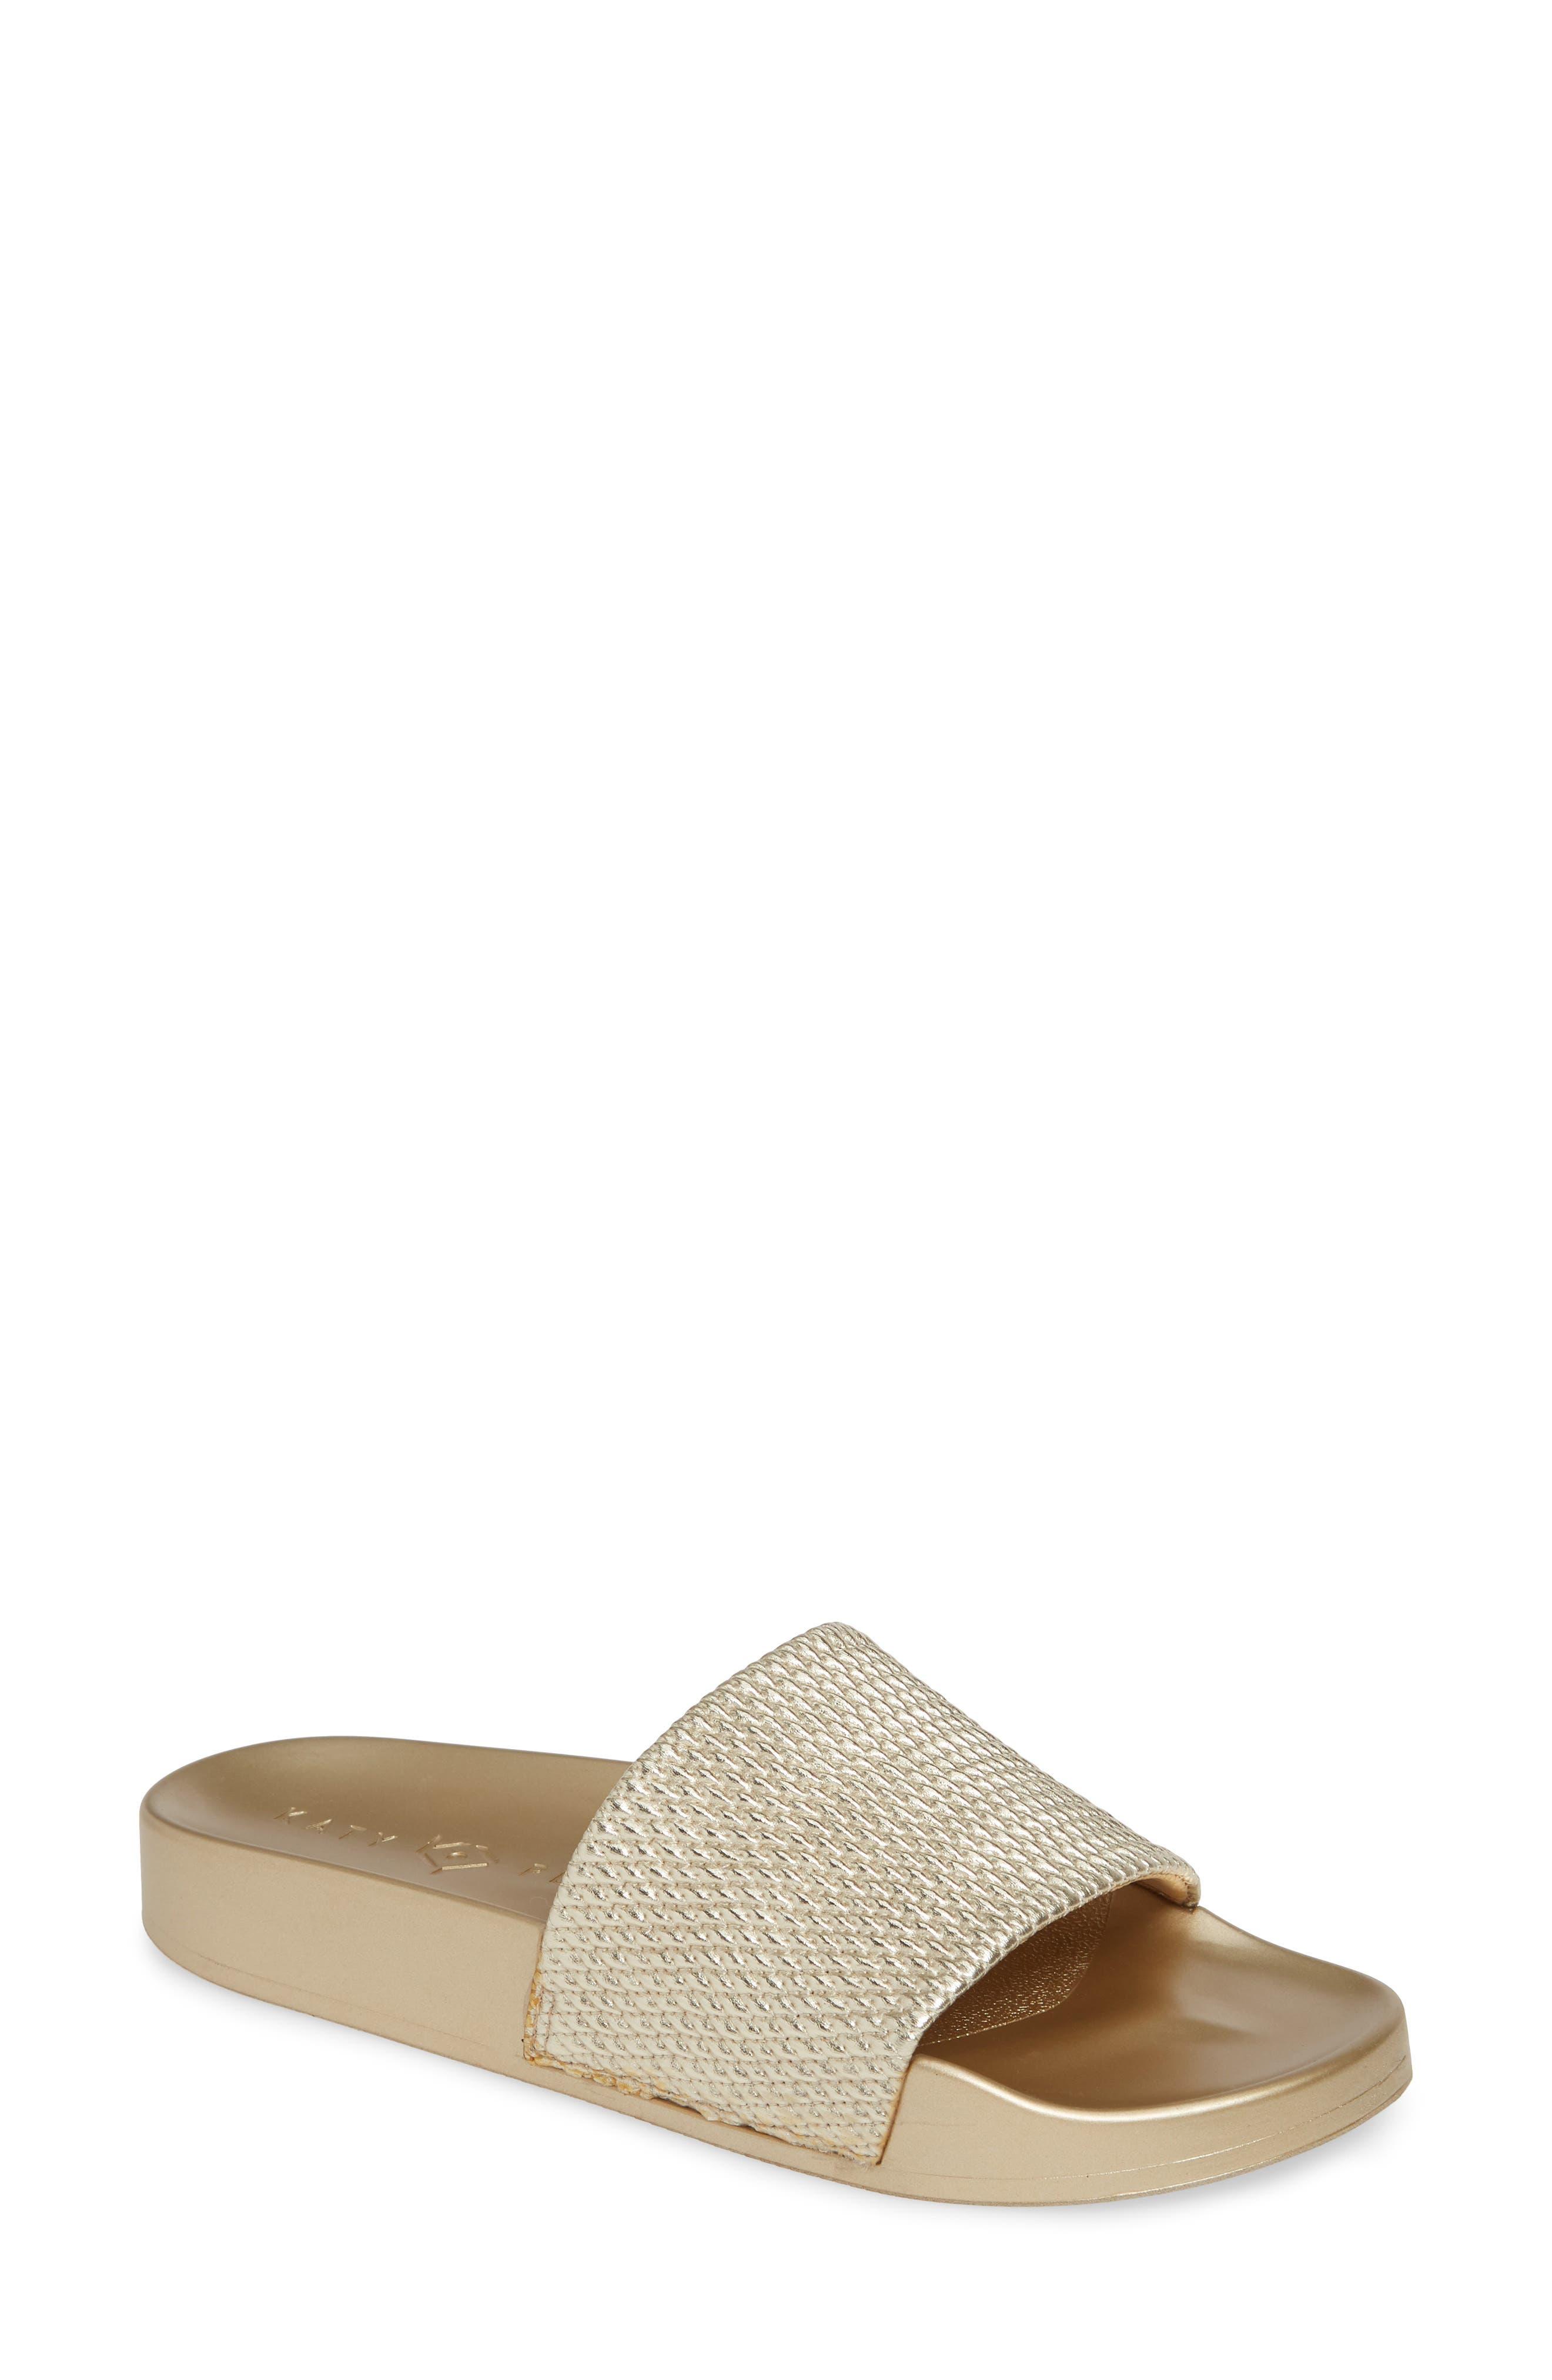 women's katy perry the jimmi slide sandal, size 10 m - metallic